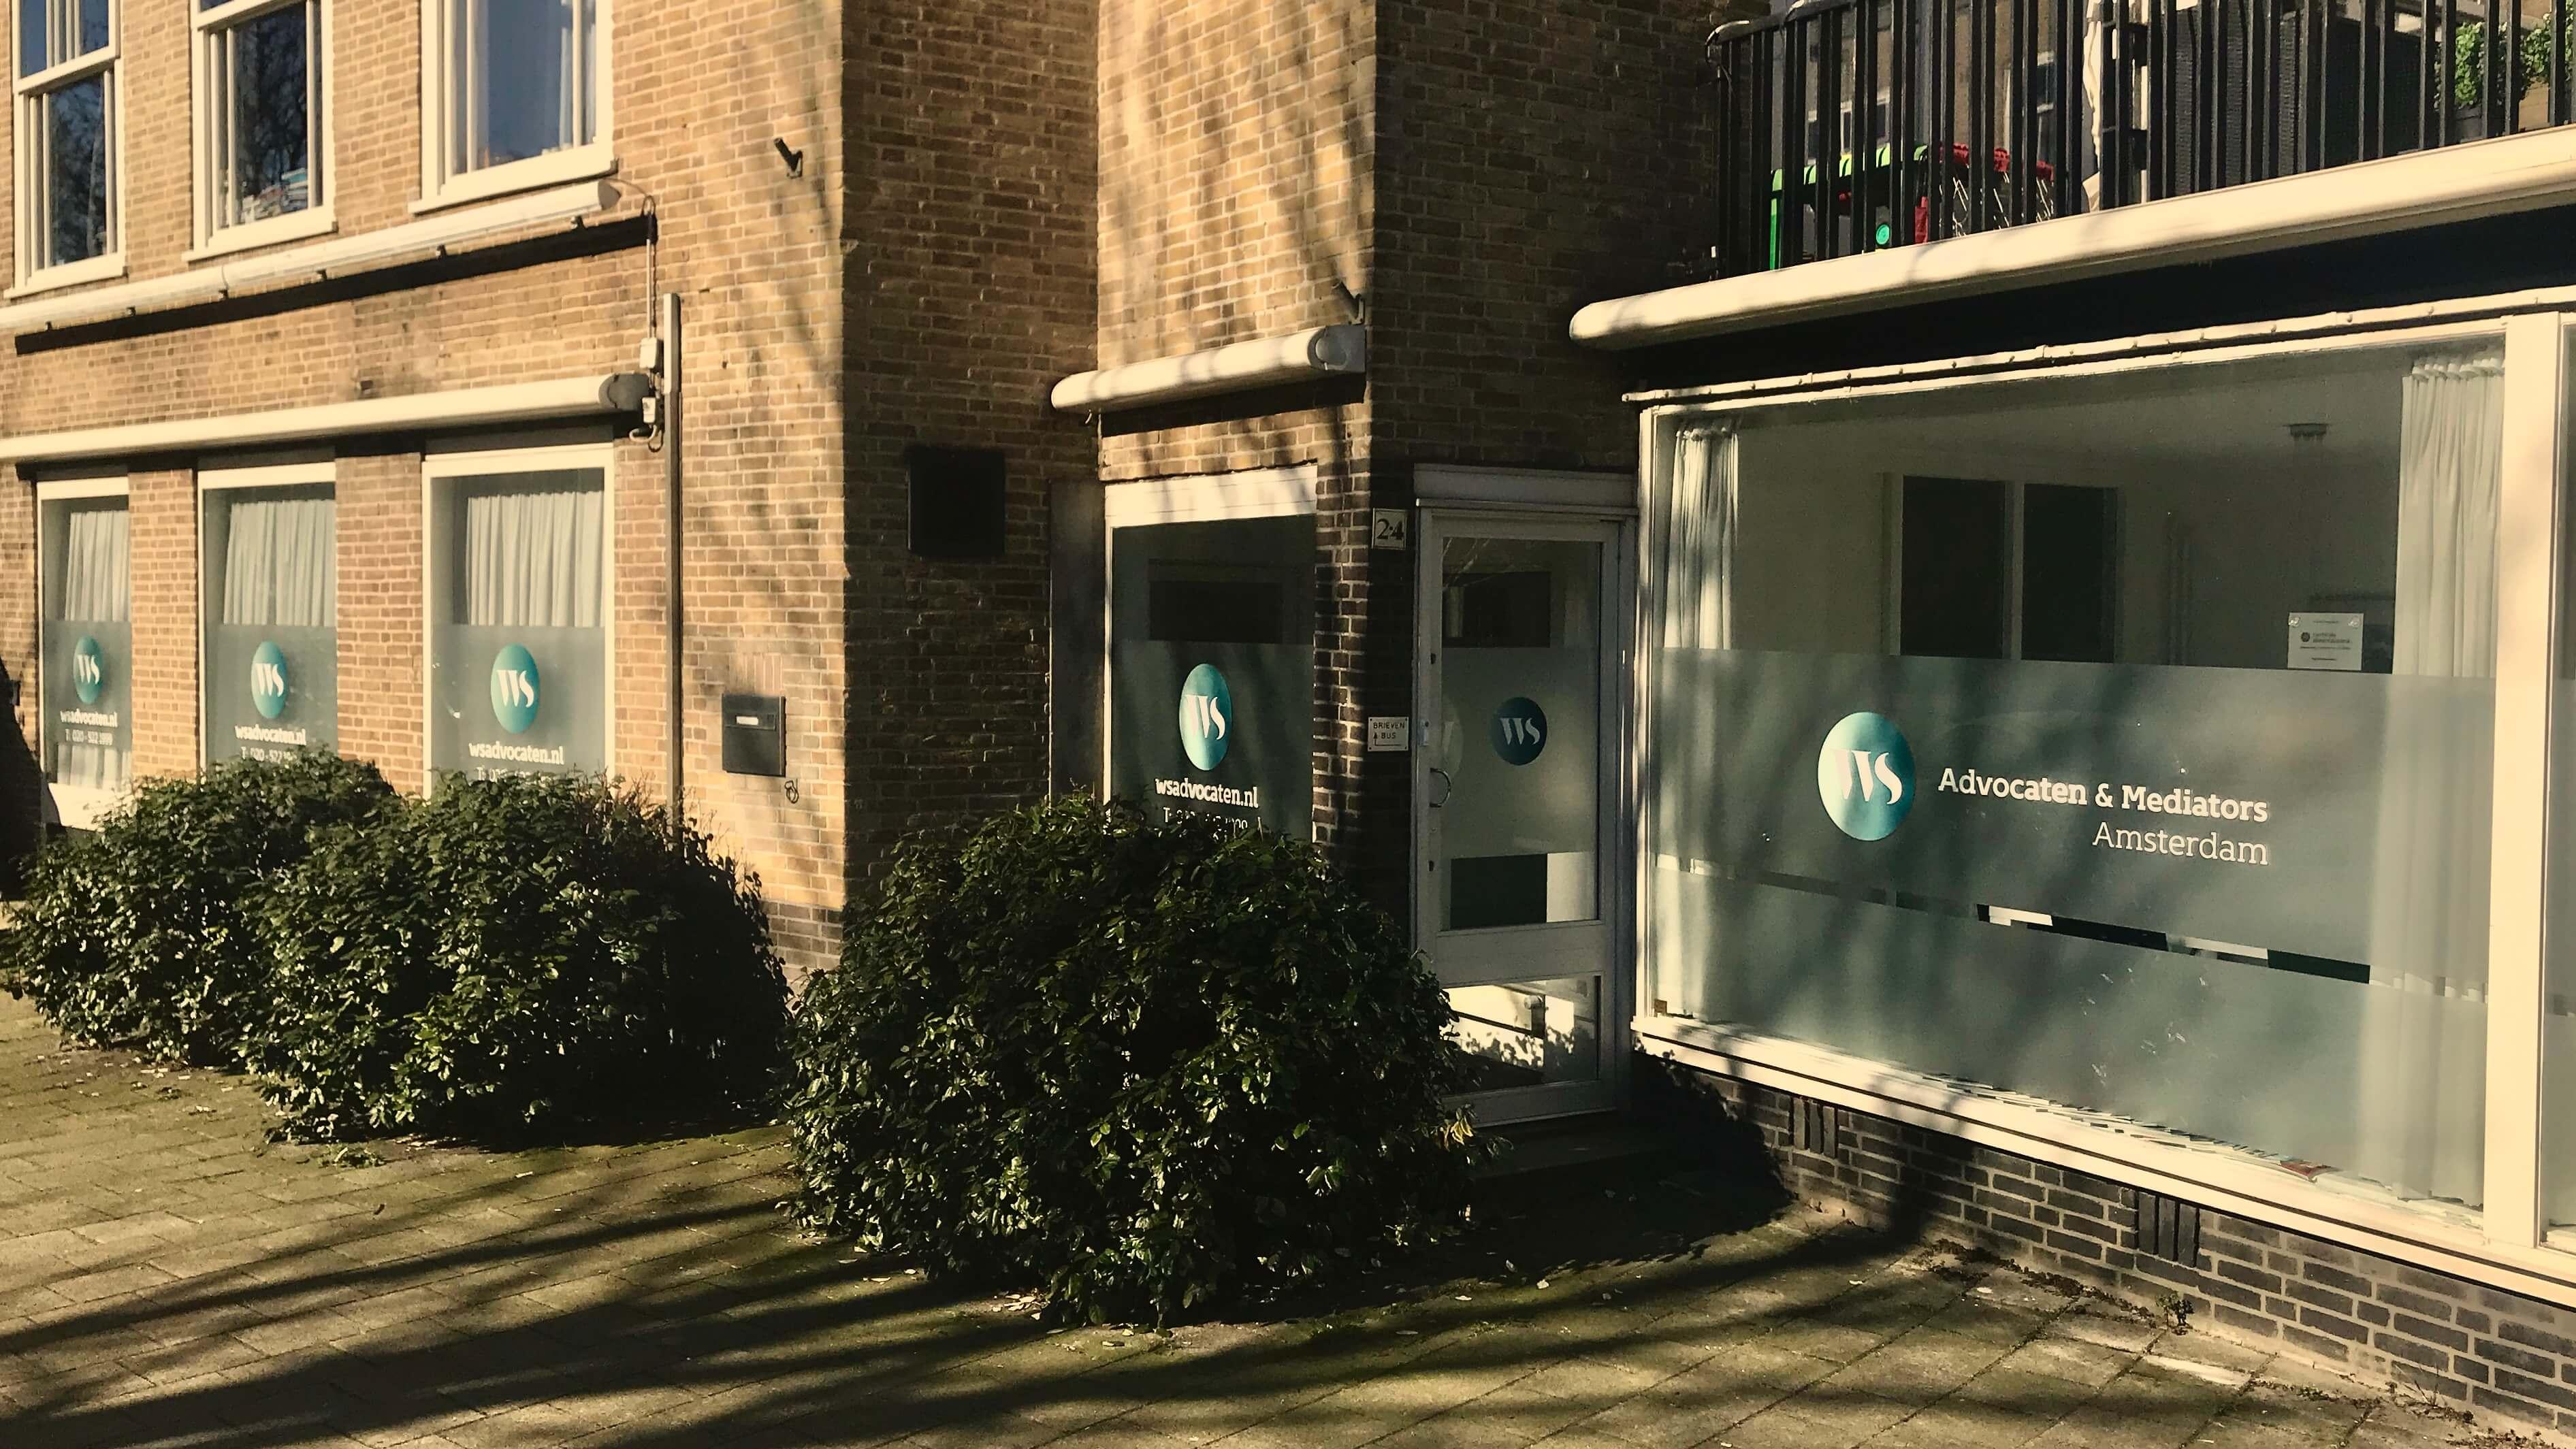 Inloopspreekuur advocatenkantoor Amsterdam, gratis juridisch spreekuur advocaten Amsterdam Zuid juridisch loket